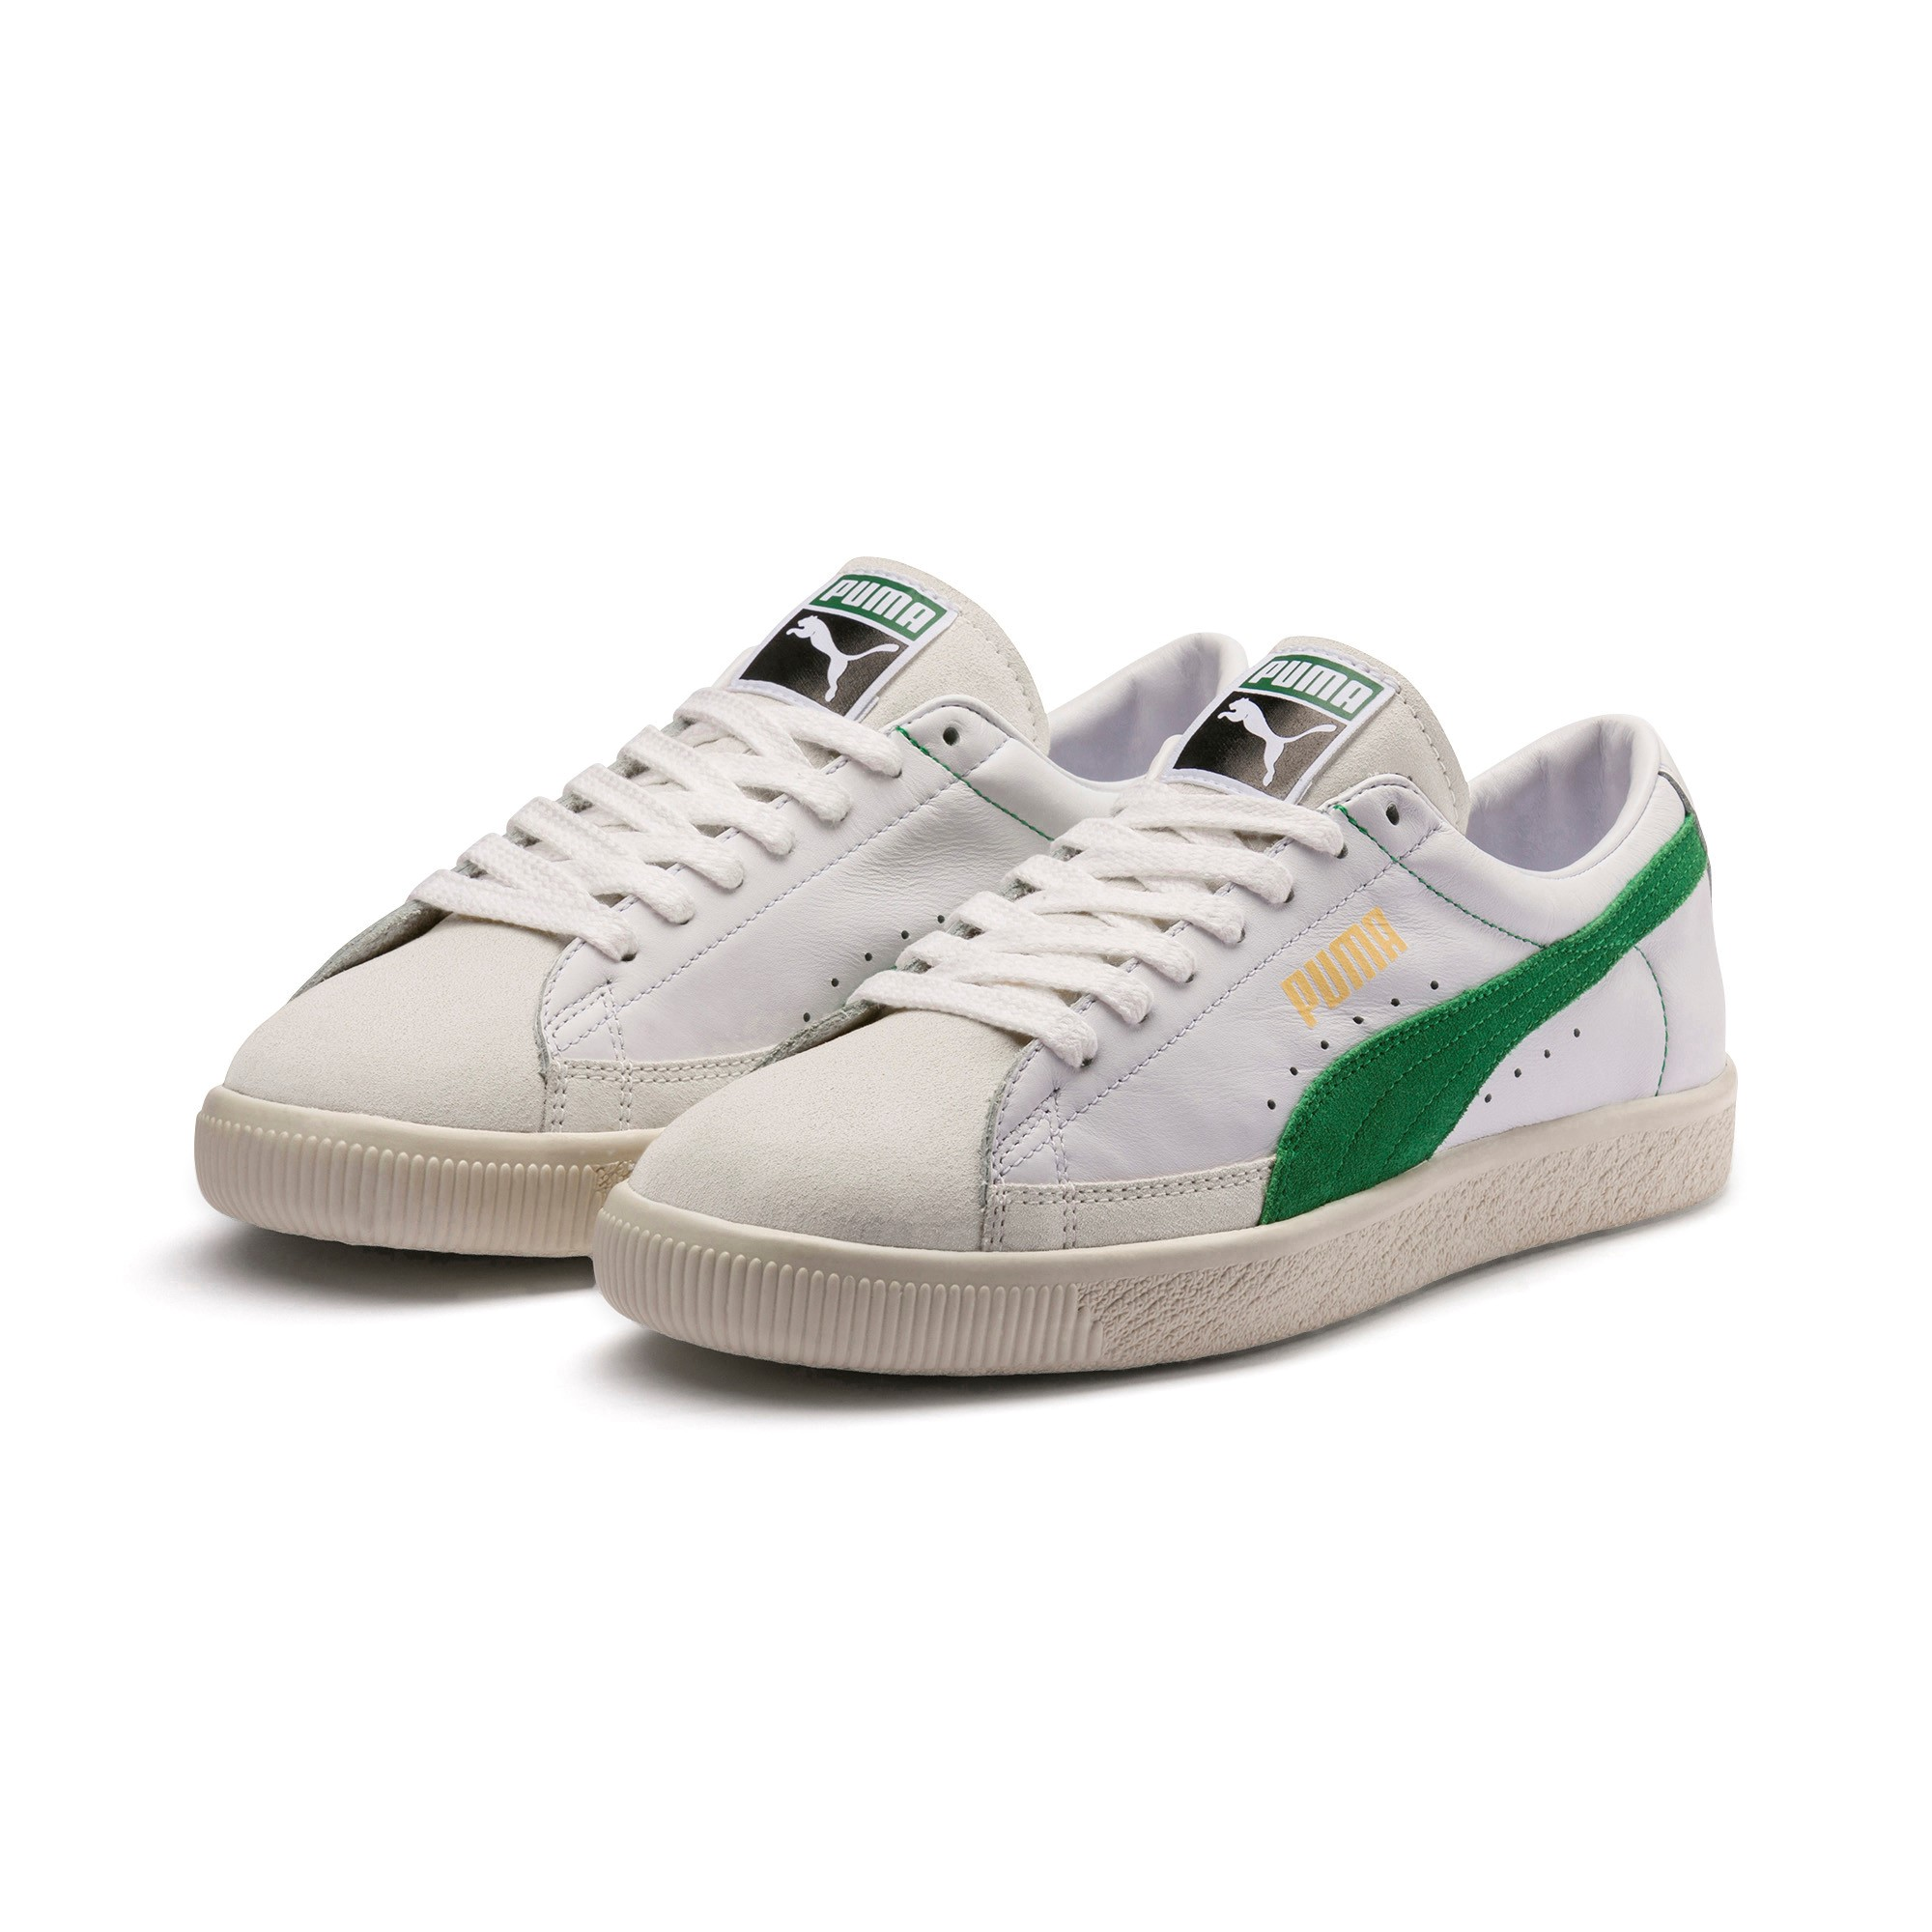 Scarpe Basket Amazon Green 90680 Sixstreet White Shop Puma knw0XP8O